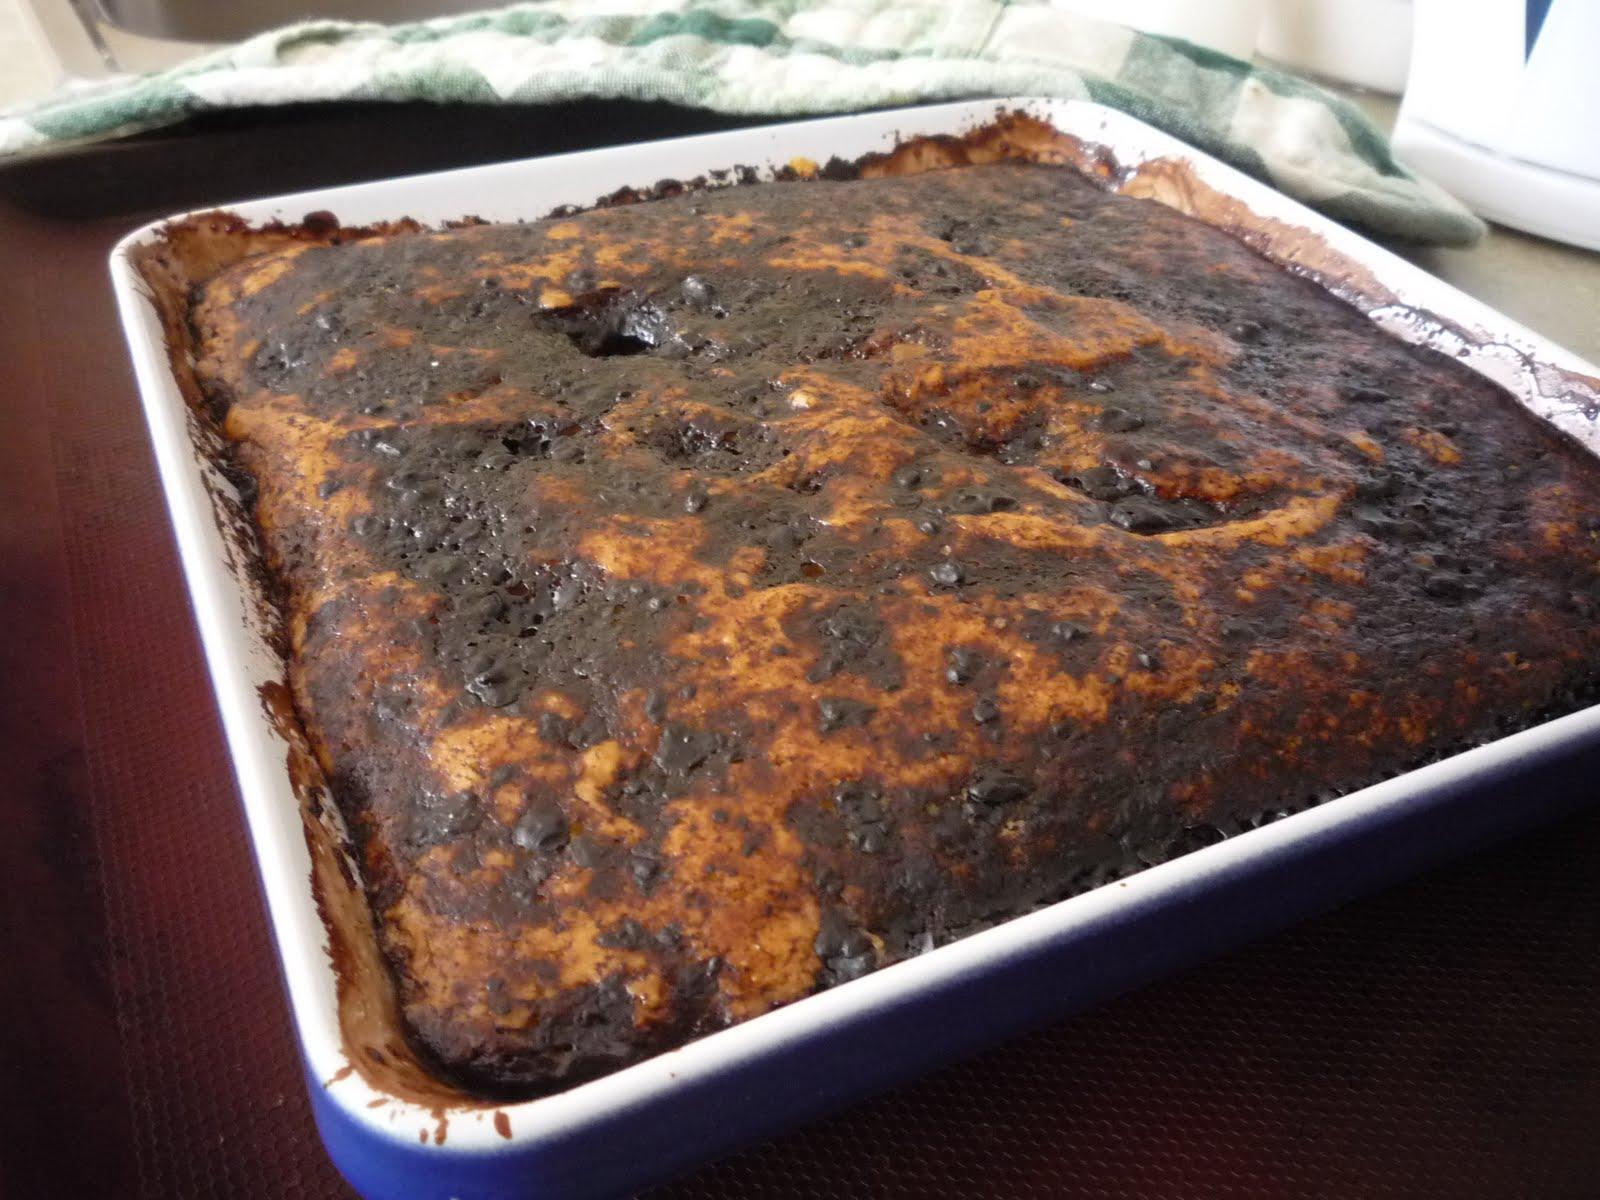 cake moist was by chocolate cake with chocolate chocolate ganache